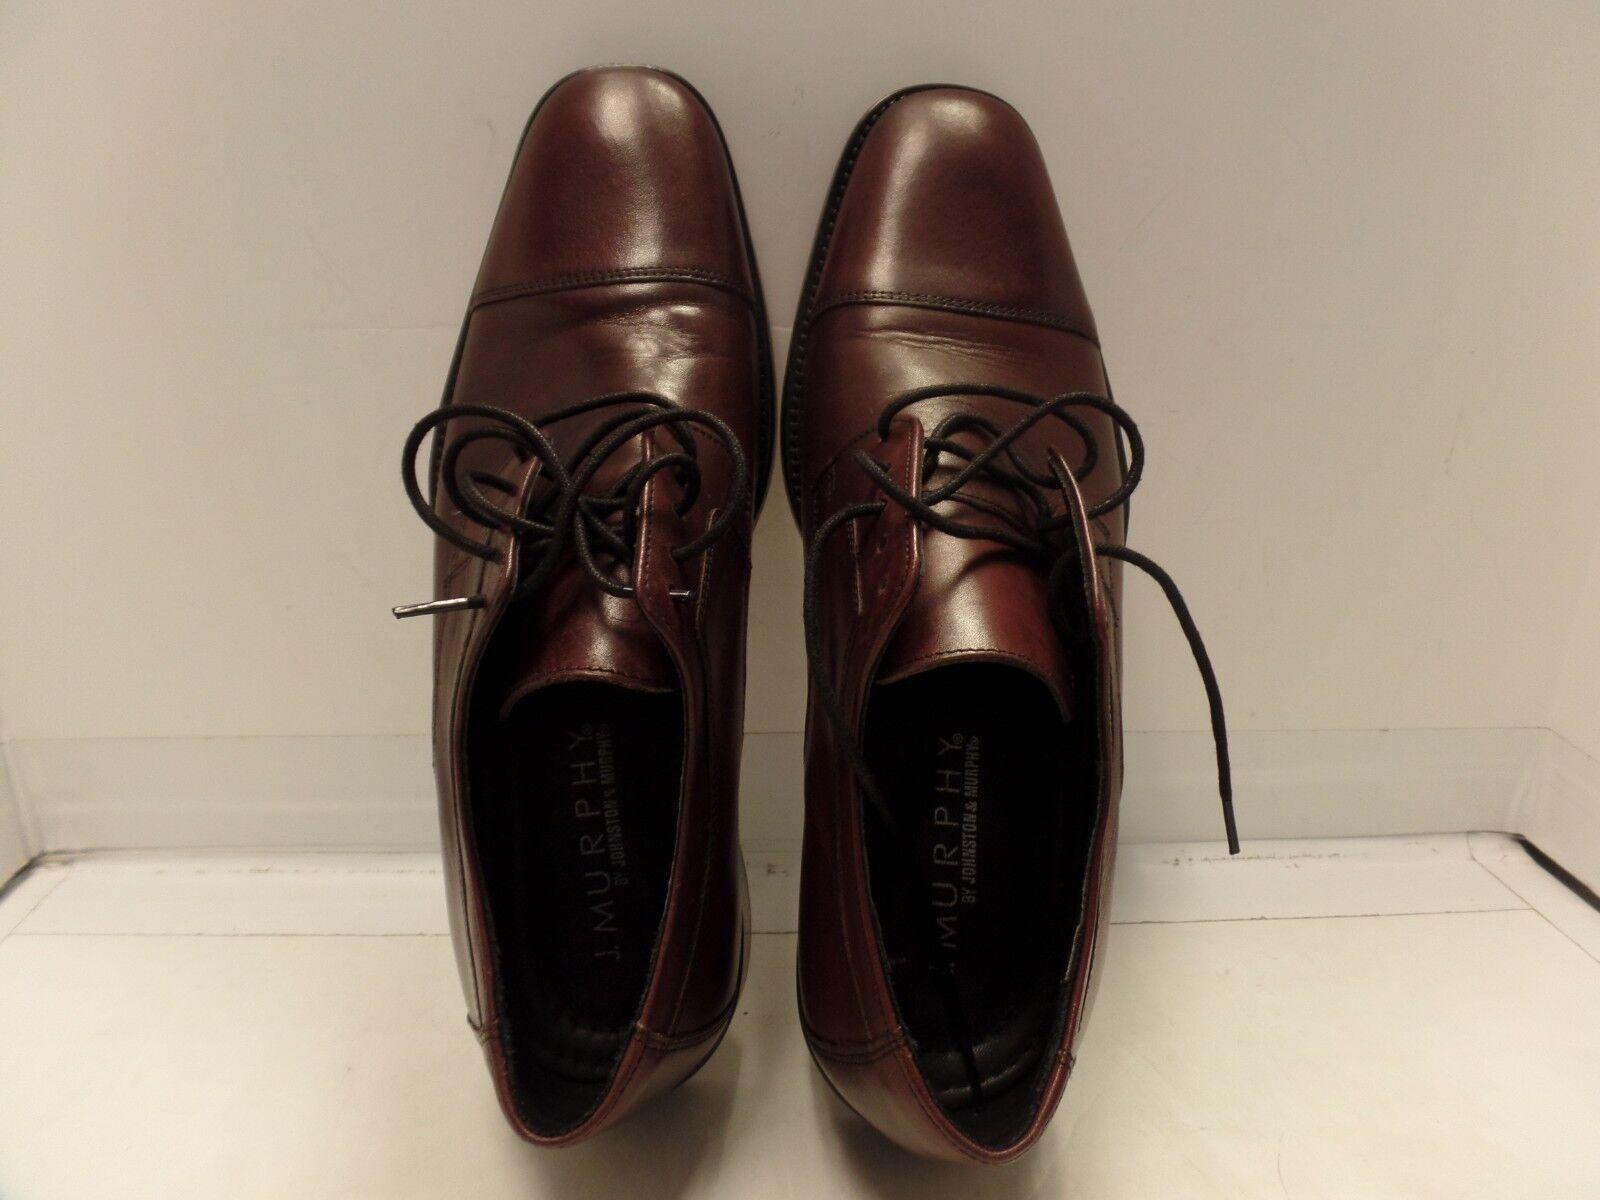 J. Murphy by JOHNSTON & MURPHY 59-11703 Burgundy Leather Cap Toe Oxfords 10.5 M